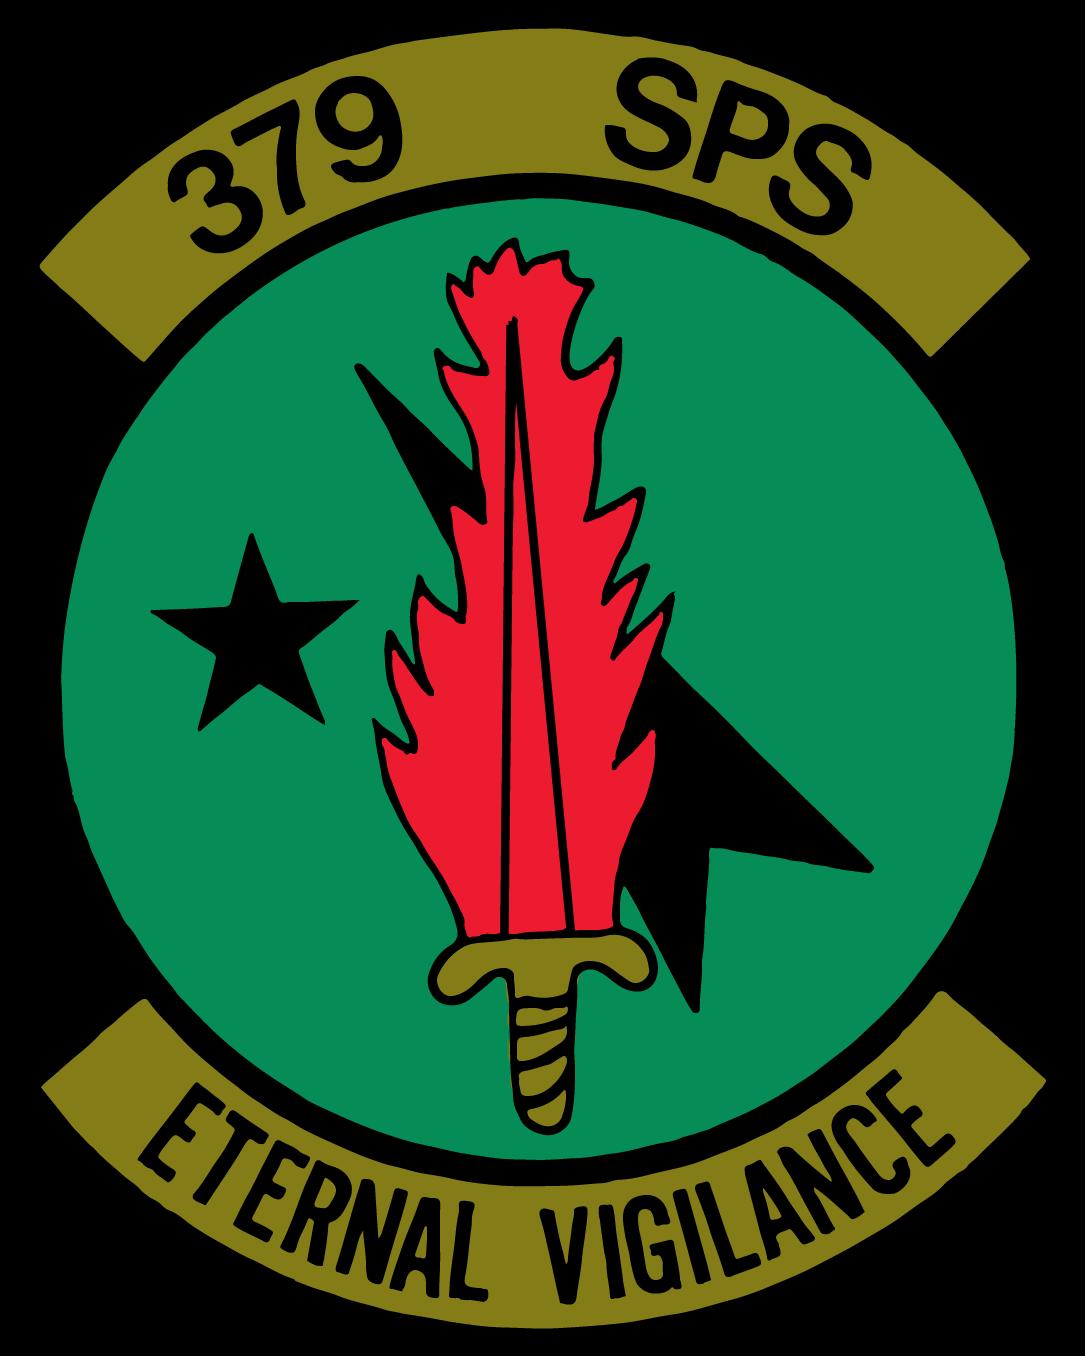 833rd aero squadron - 379th Sps Eternal Vigilance